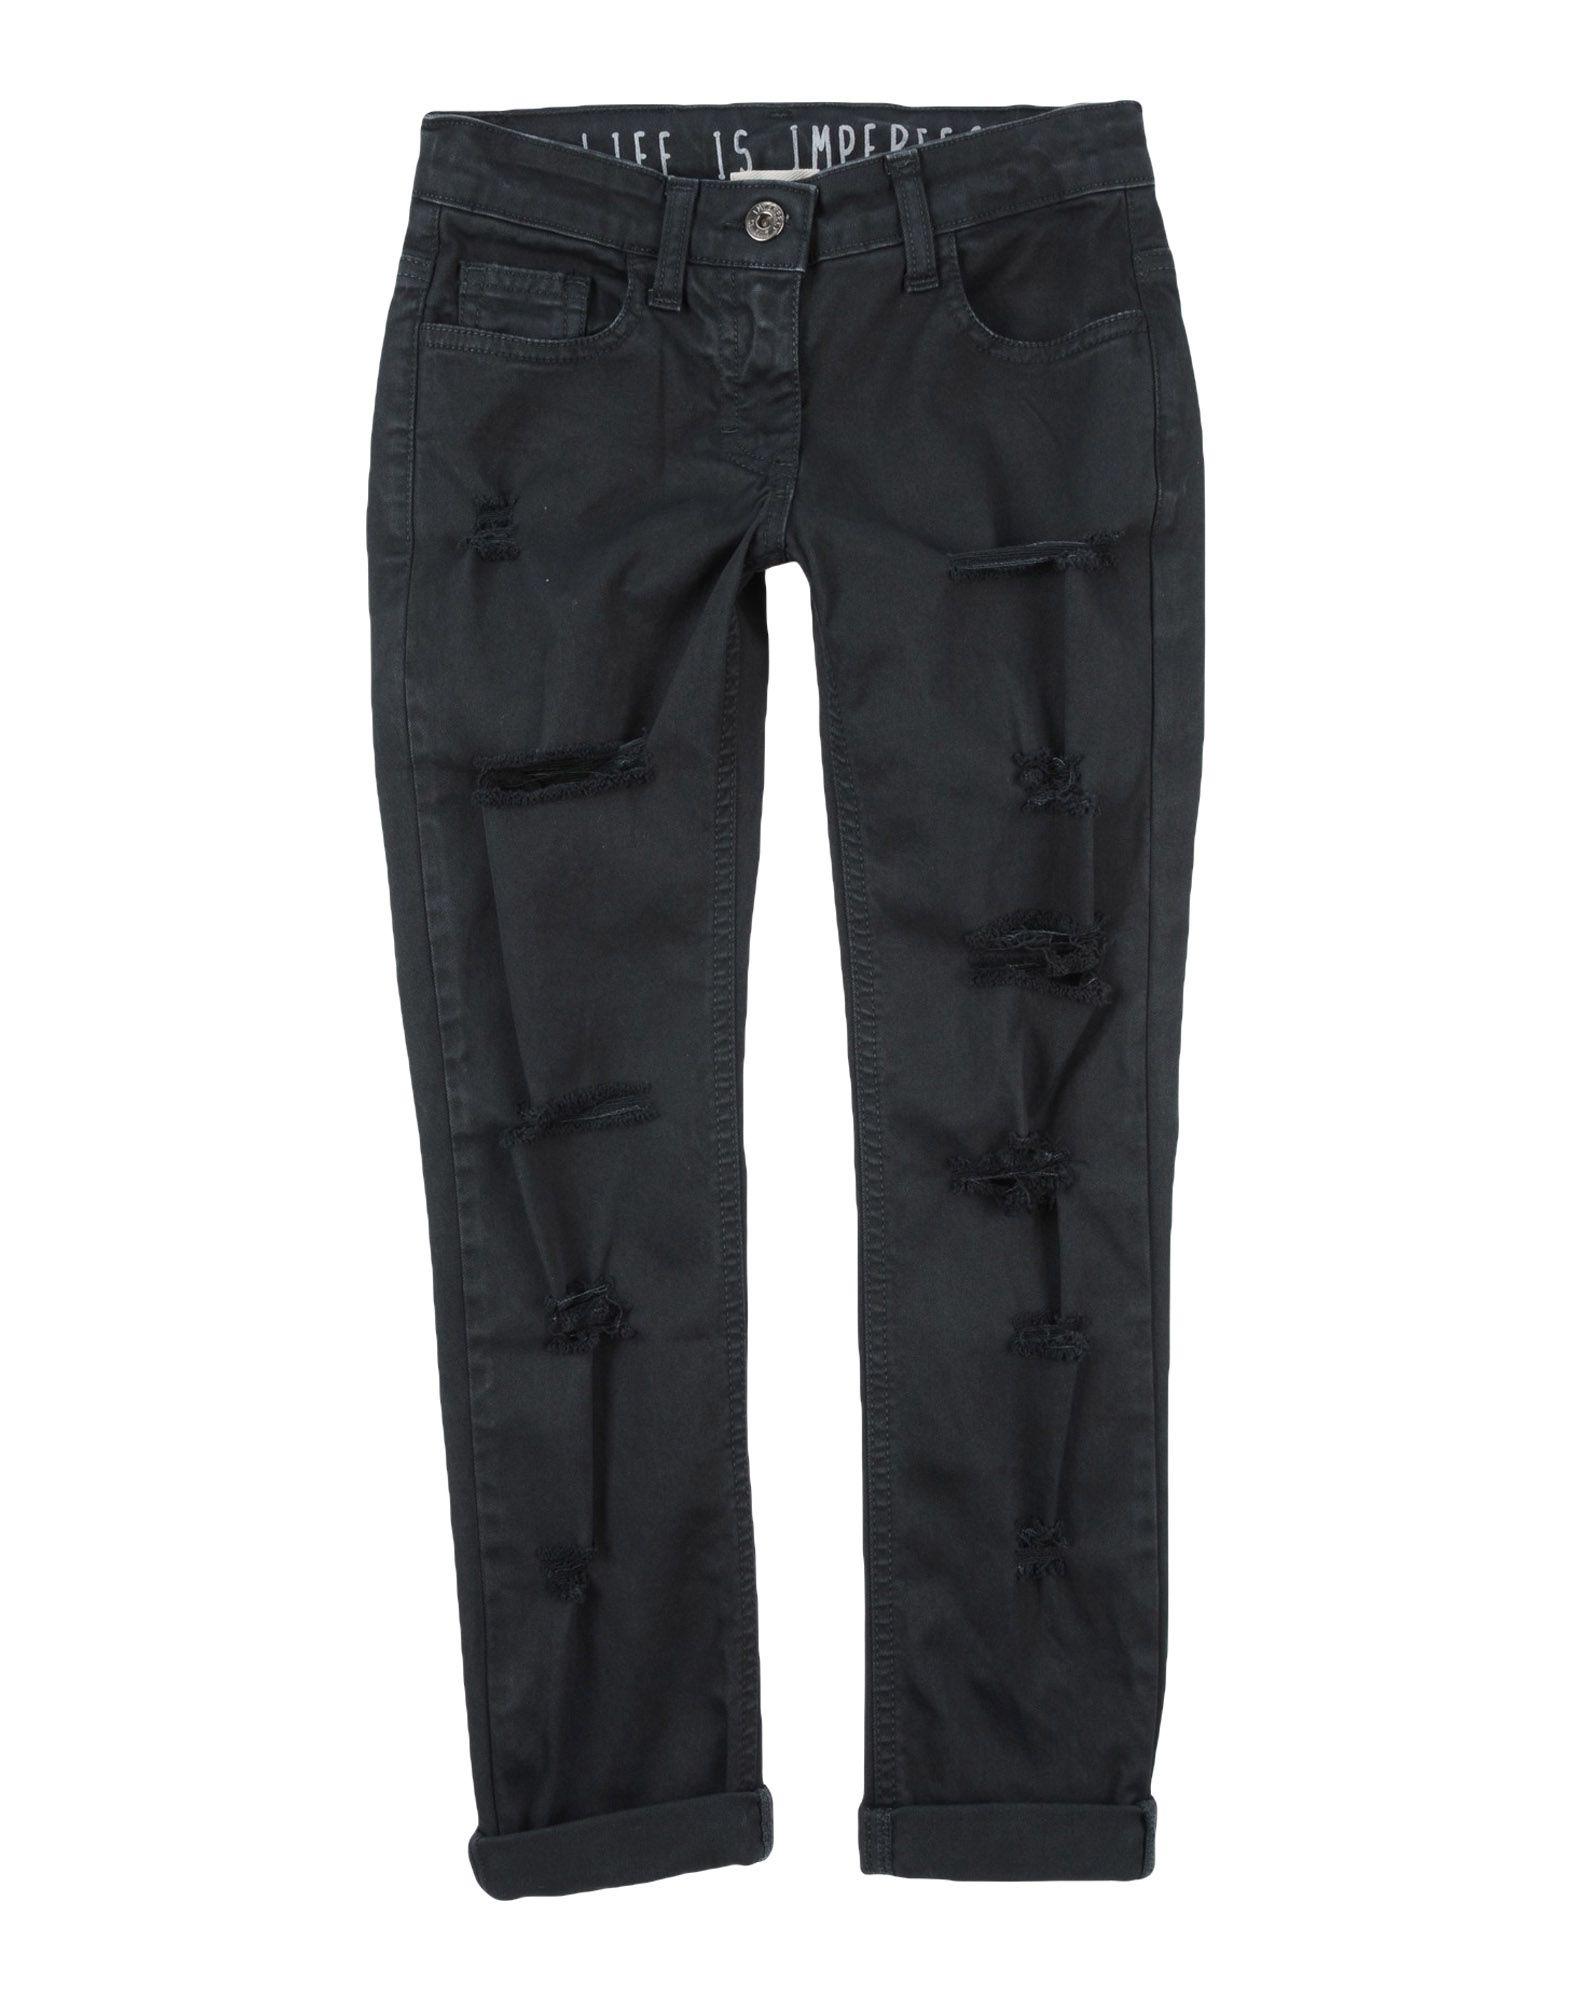 !m?erfect Kids'  Jeans In Steel Grey